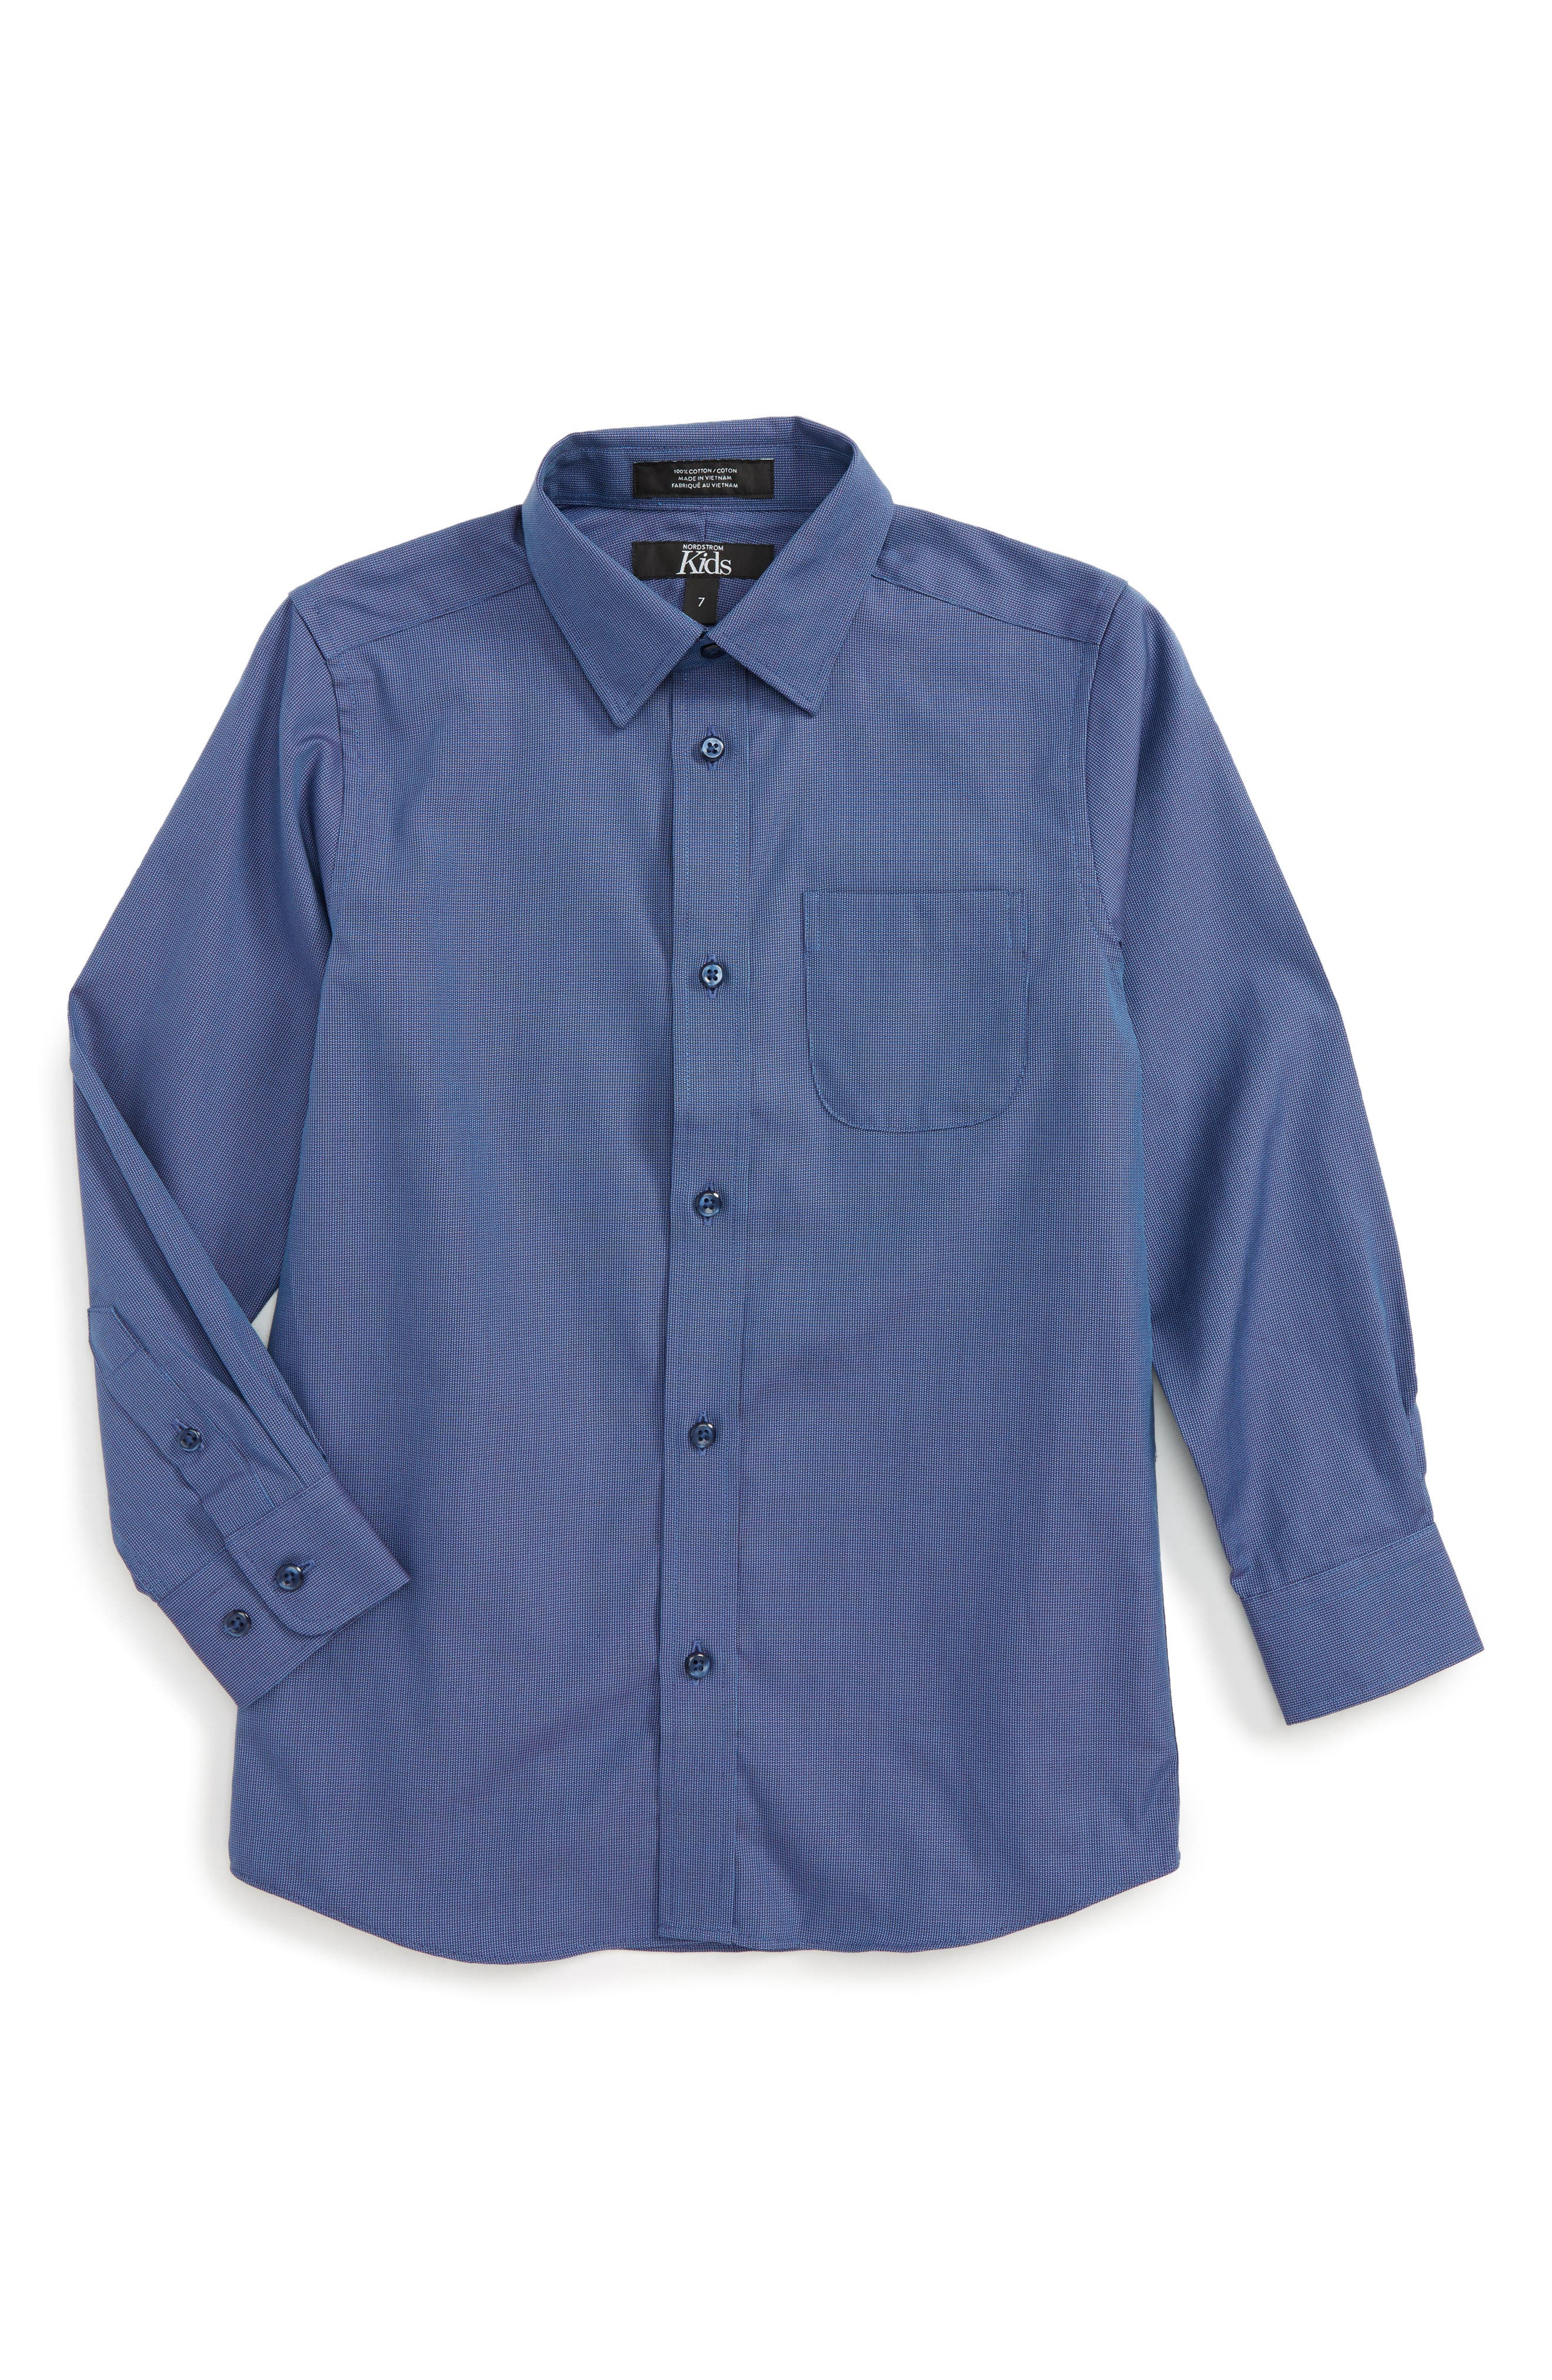 Main Image - Nordstrom Patriot Cotton Poplin Dress Shirt (Toddler Boys & Little Boys)